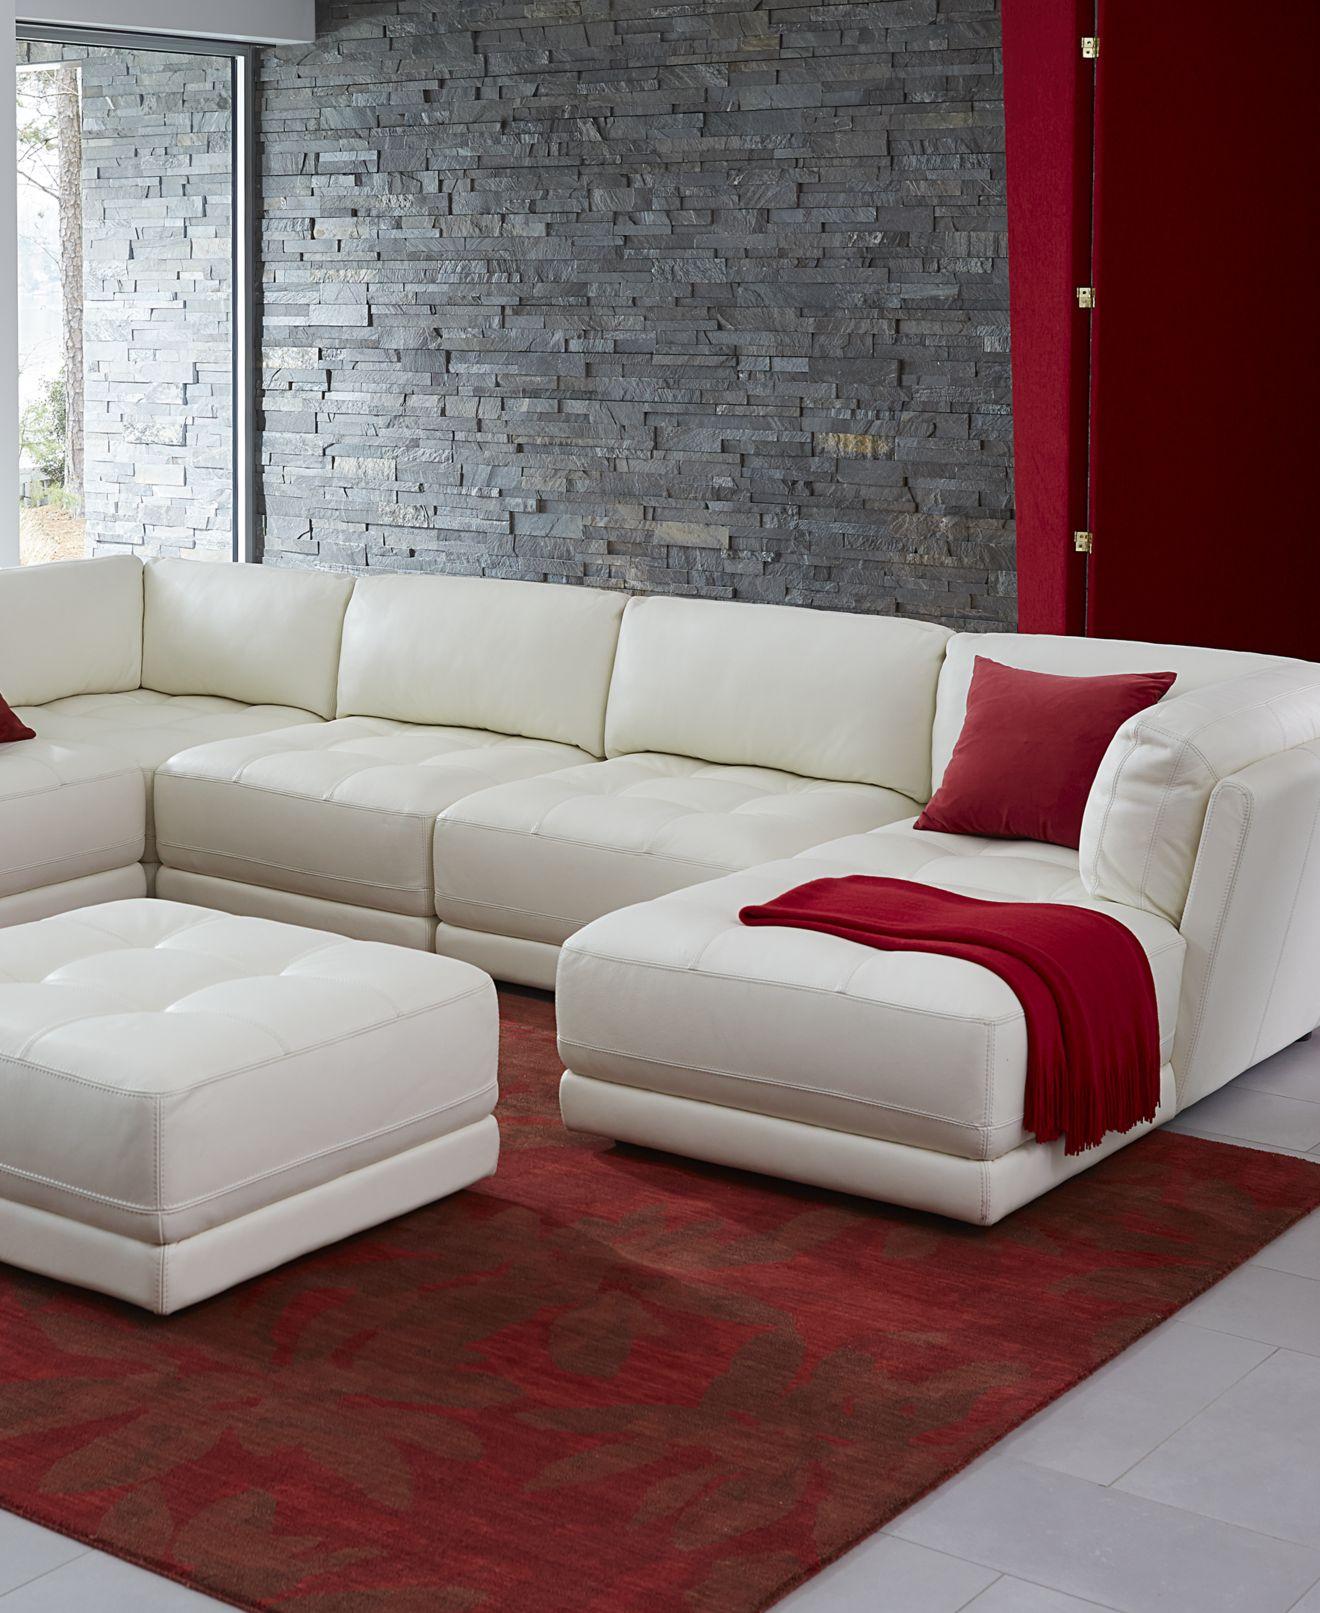 Macys Living Room Design Ideas